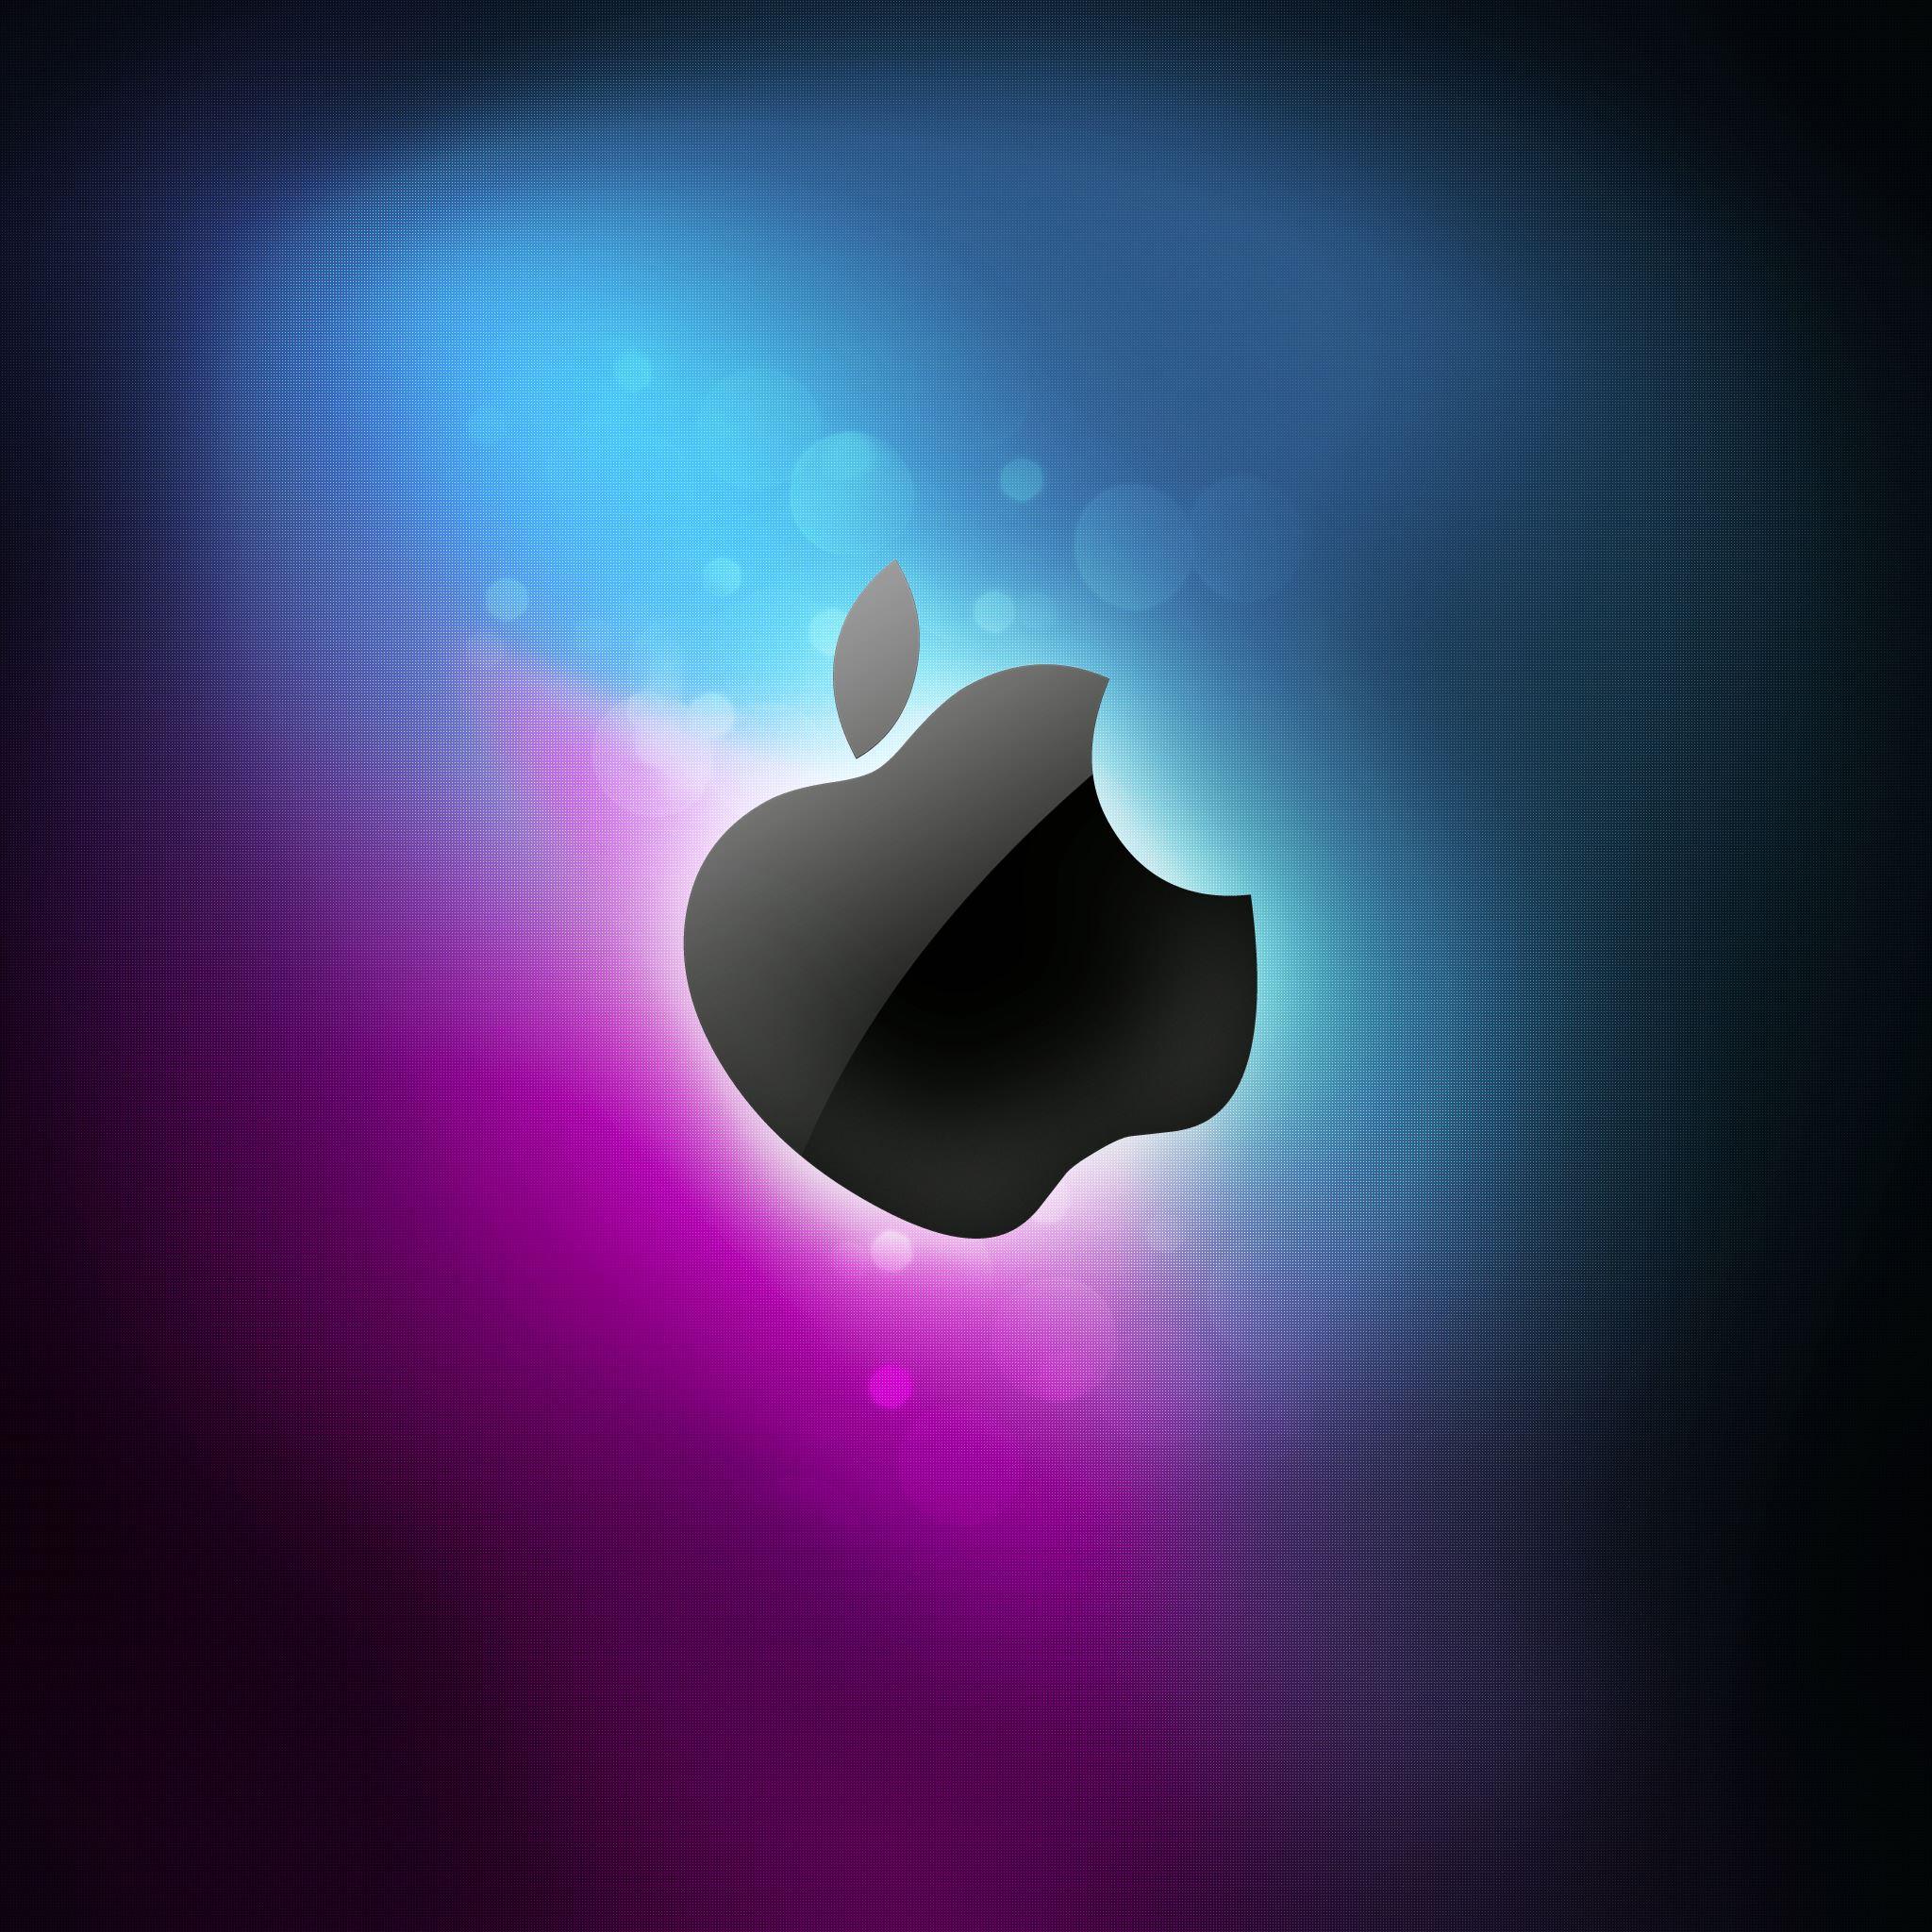 apple logo ipad air wallpaper download   iphone wallpapers, ipad